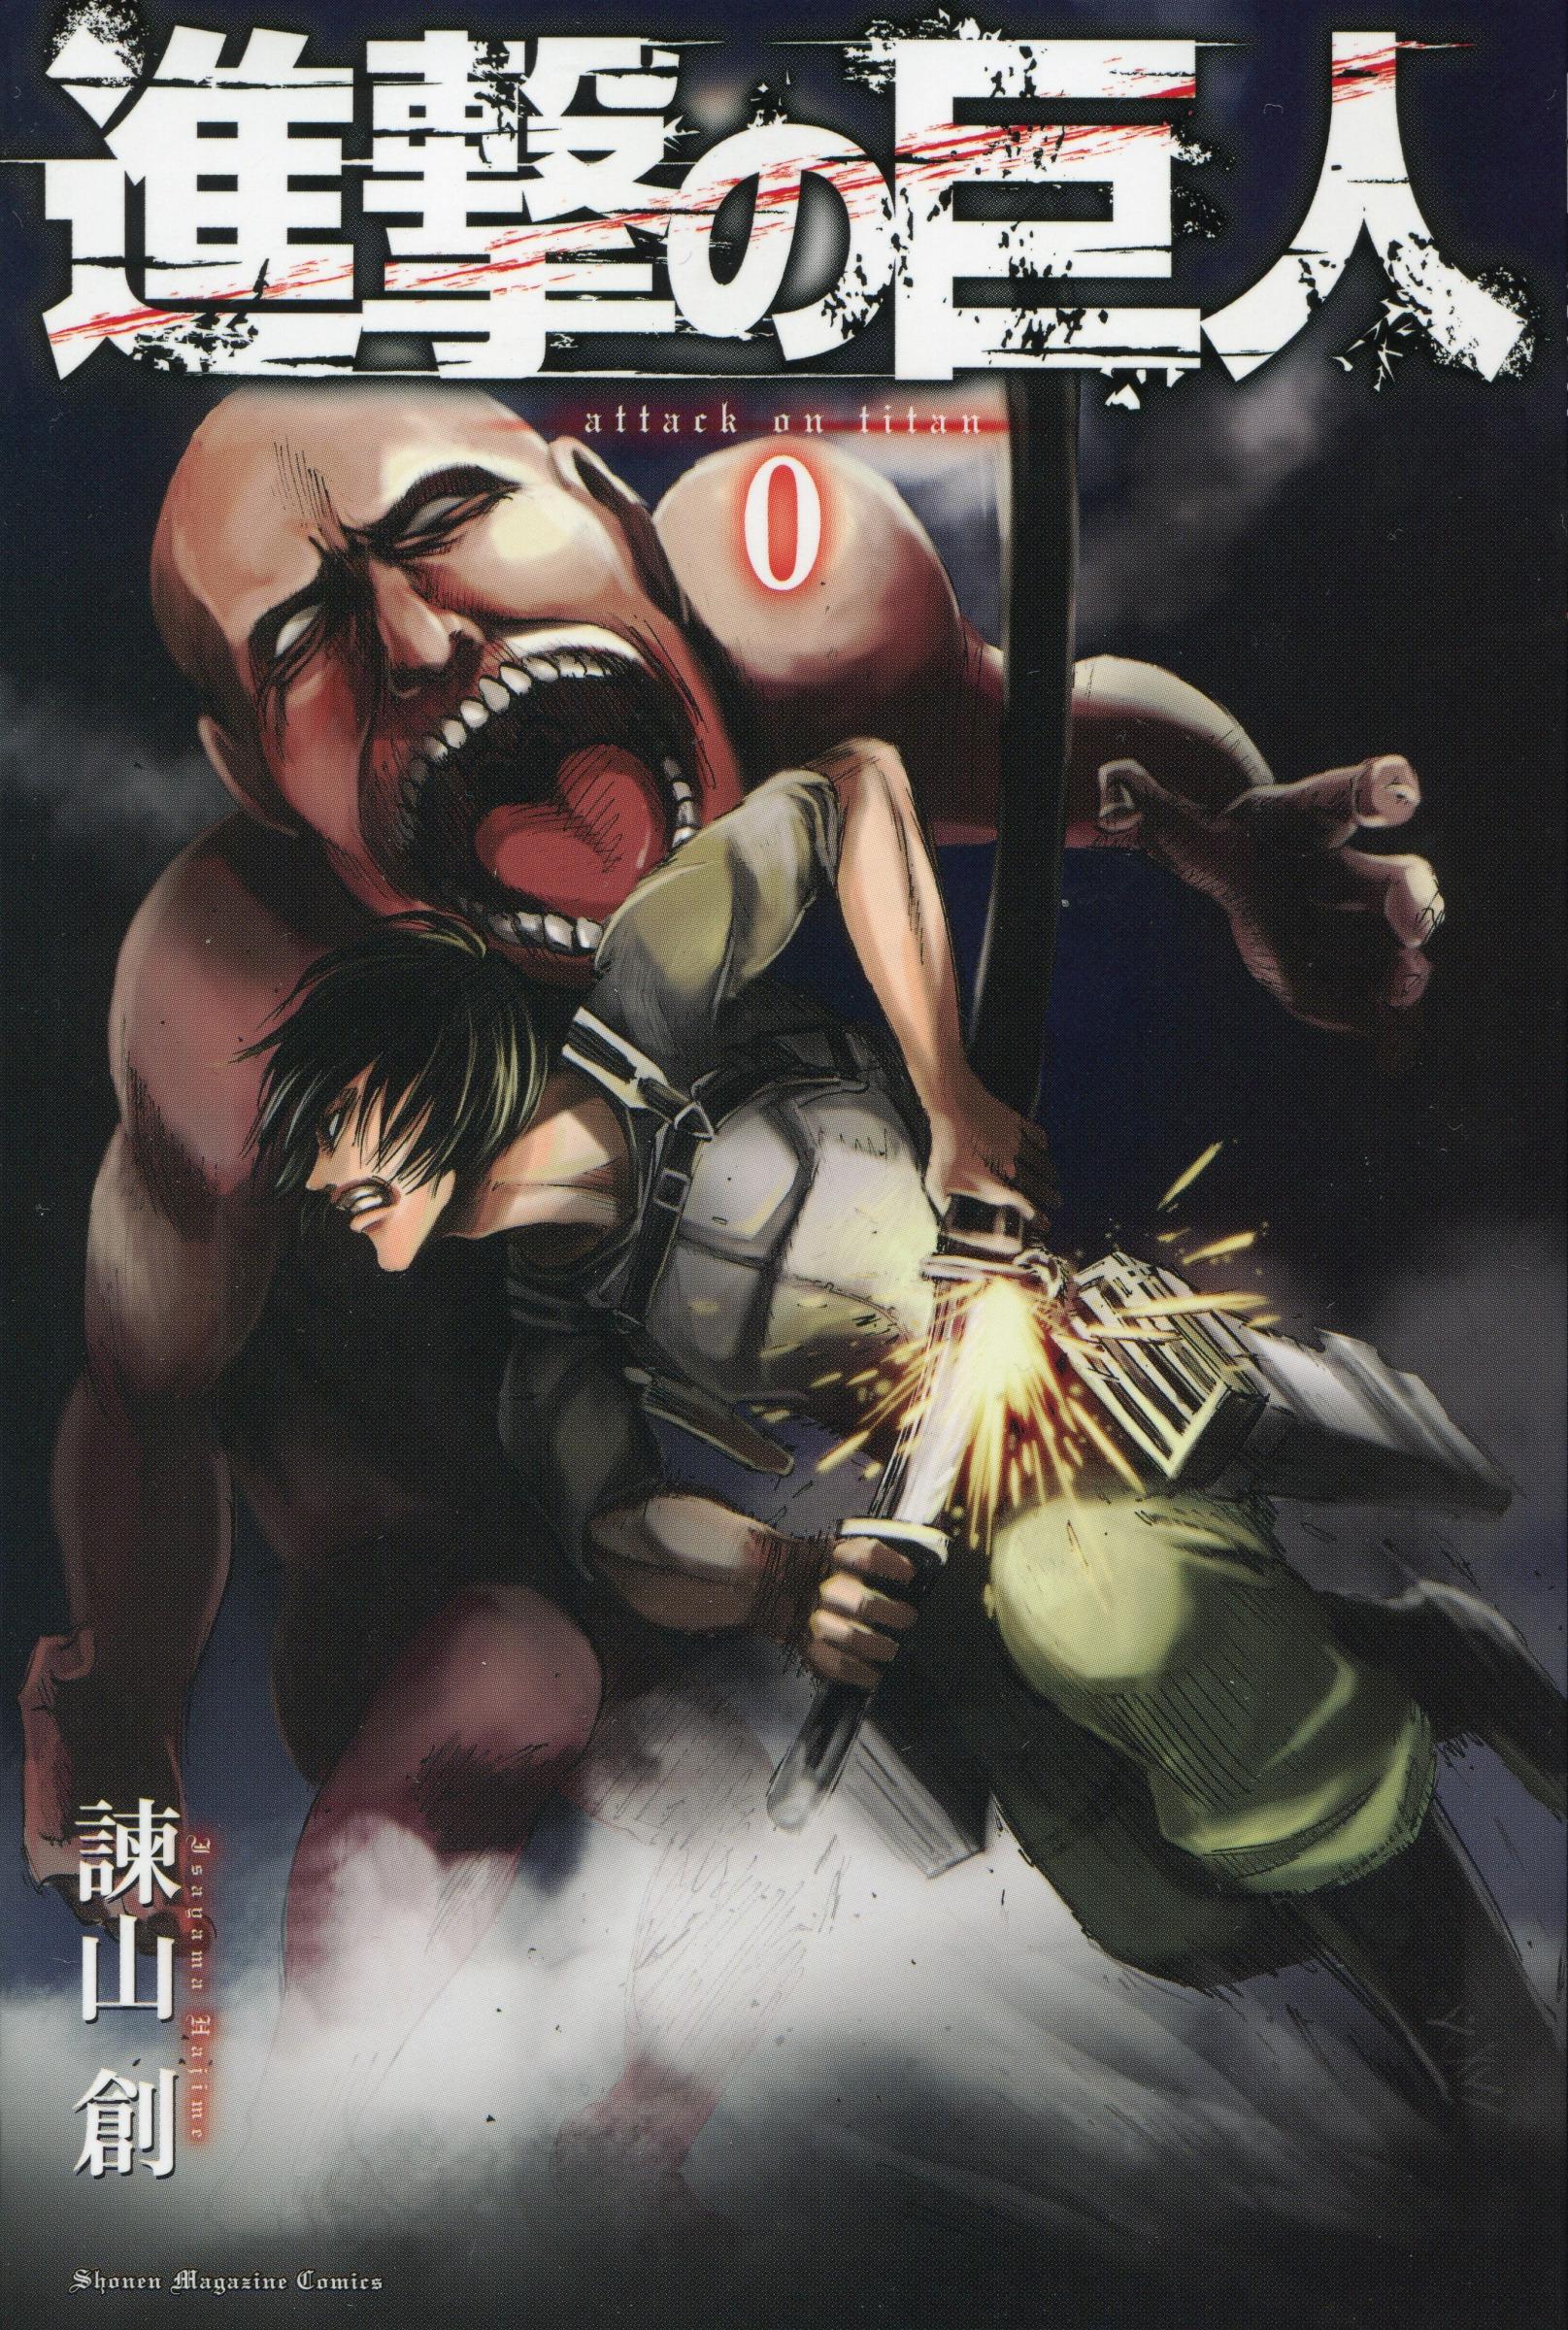 Attack on Titan original draft volume 0 cover